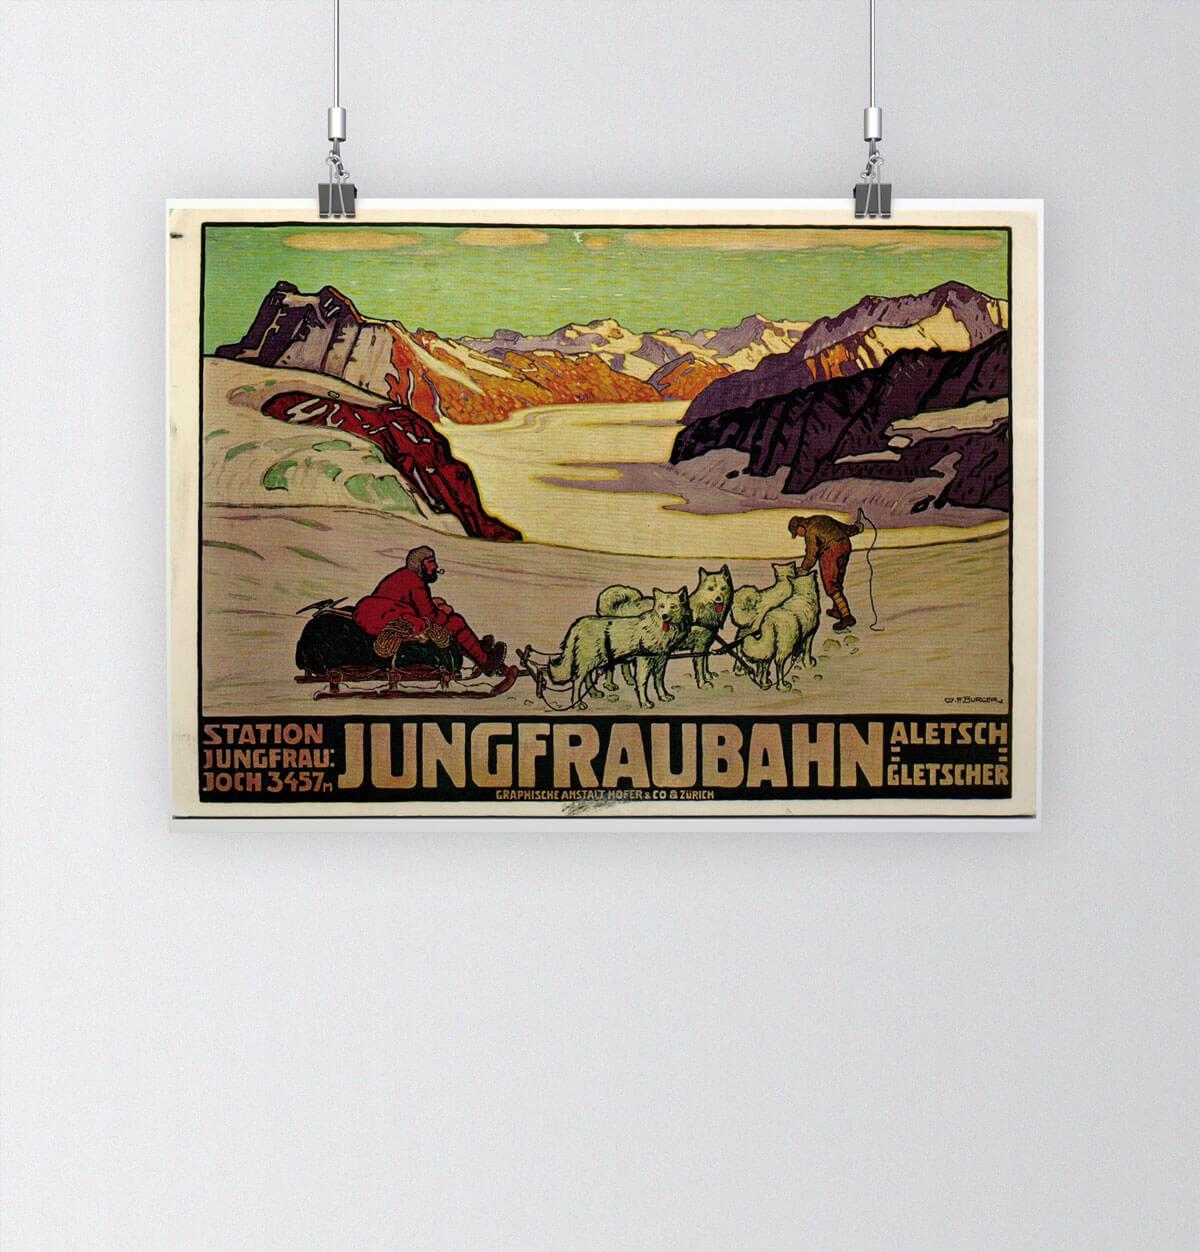 Tour of Switzerland - Vintage Posters - Jungfrau